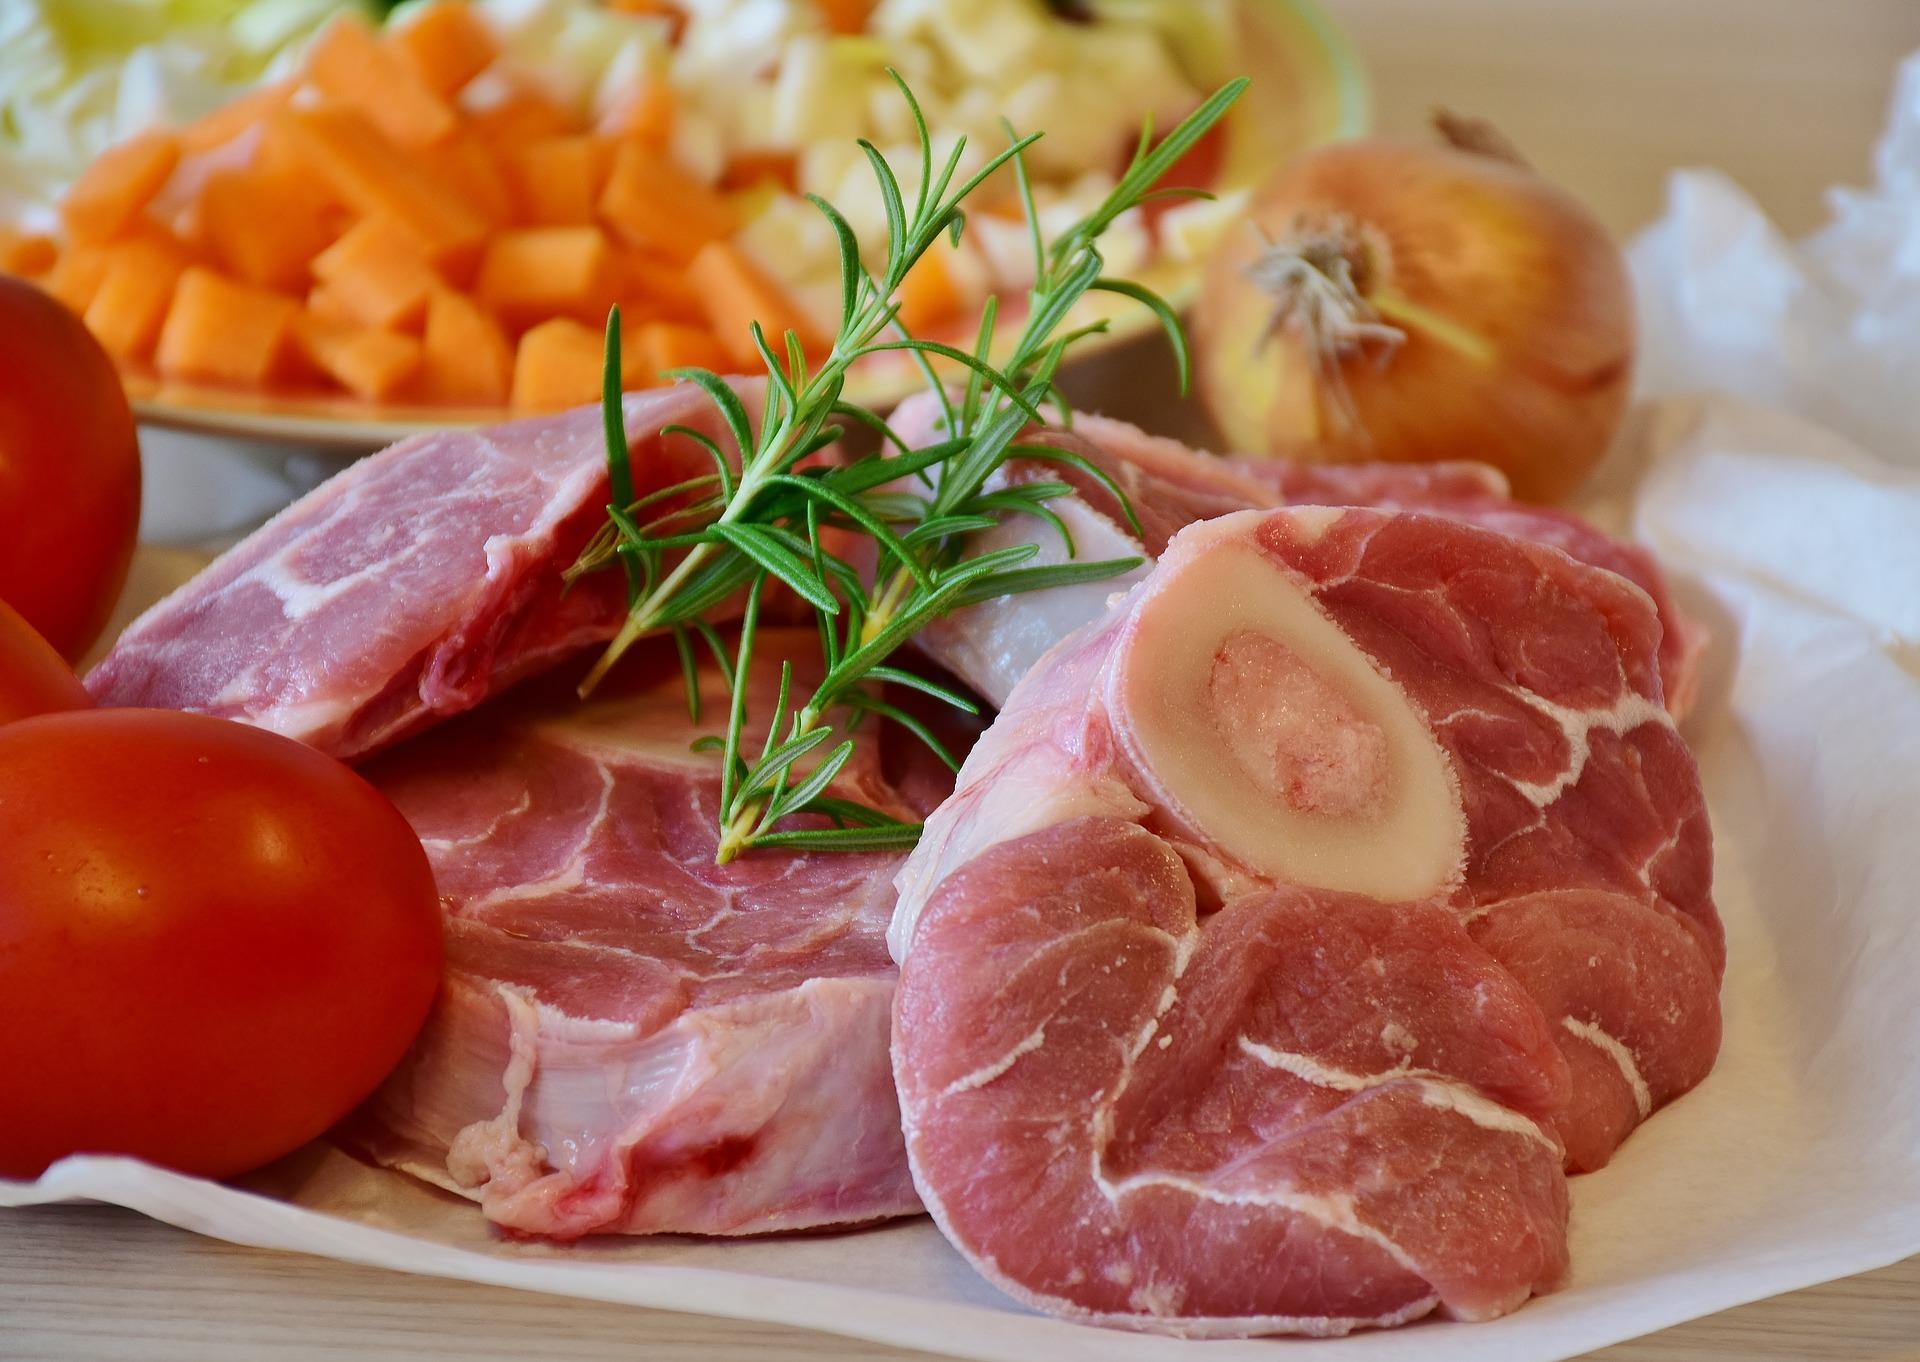 Menu Di Natale Tradizionale Veneto.Pranzo Di Natale Tradizionale Veneto Pietanze Tipiche Food Blog